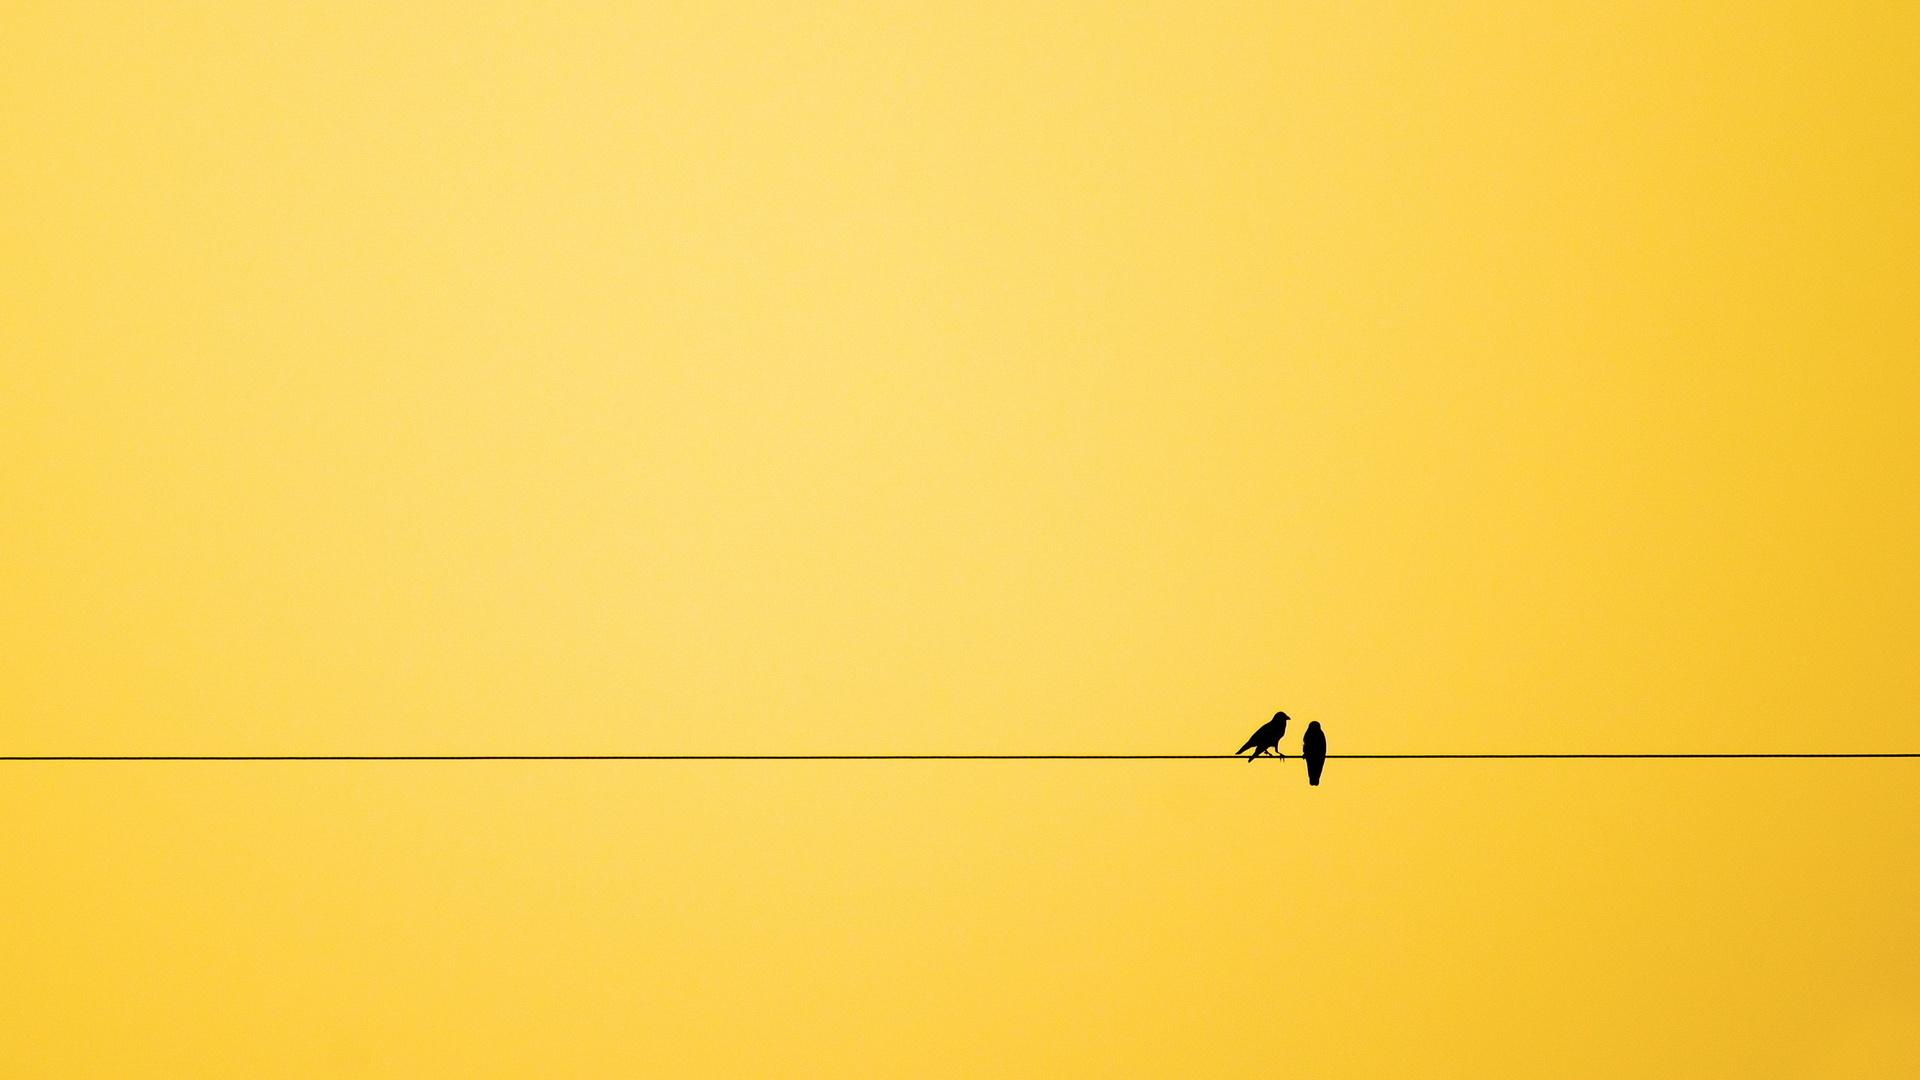 Картинка: Линия, провод, птицы, пара, жёлтый фон